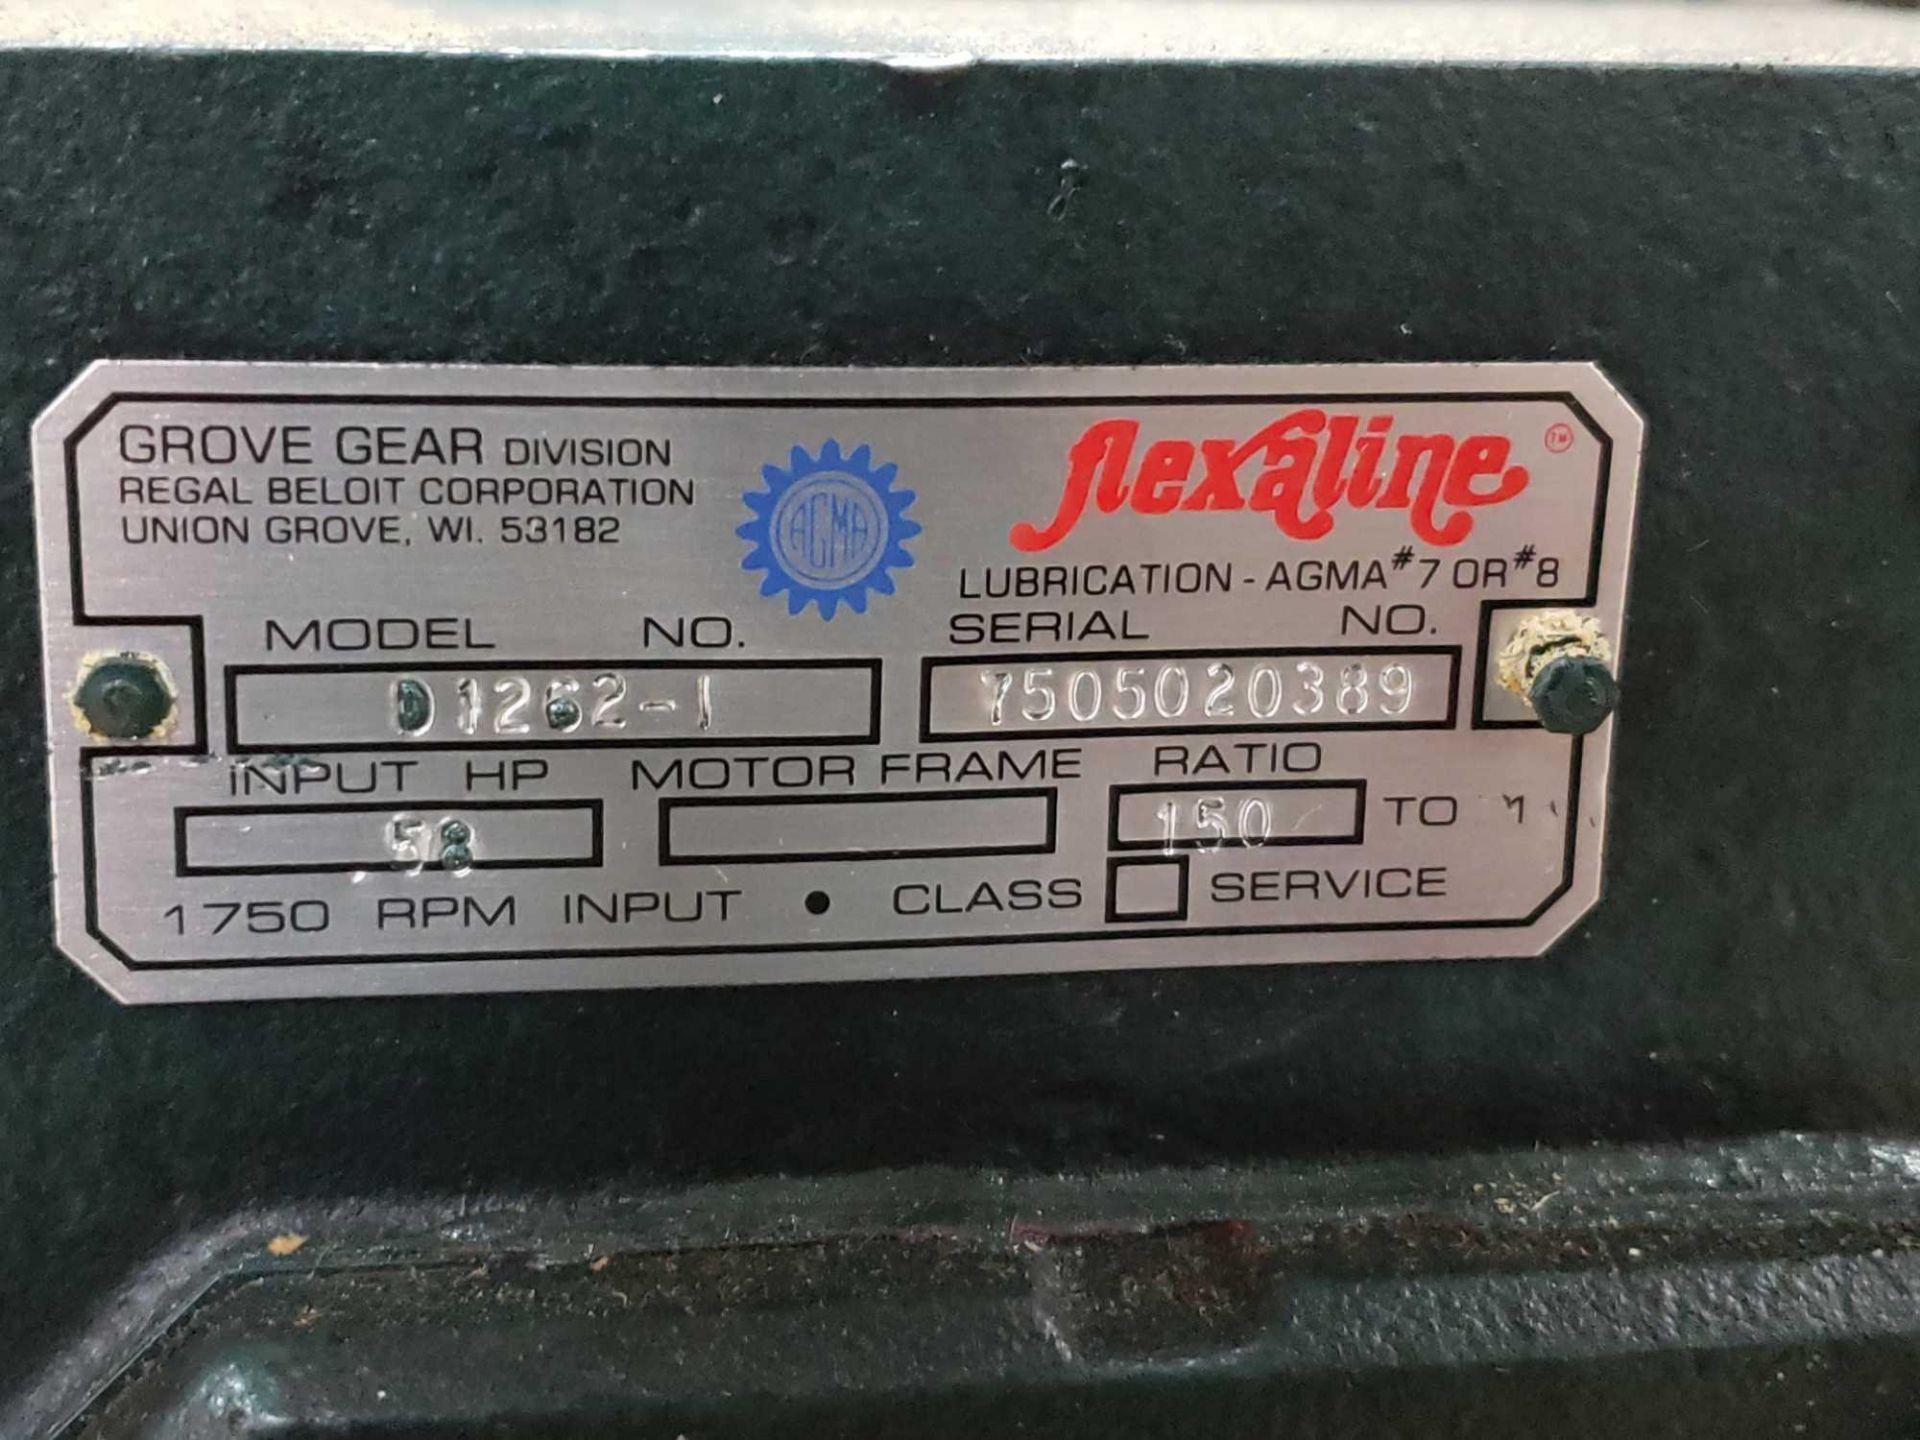 Lot 54 - Grove Gear Flexaline gearbox worm gear speed reducer model D1262-1, ratio 150:1. New in box.